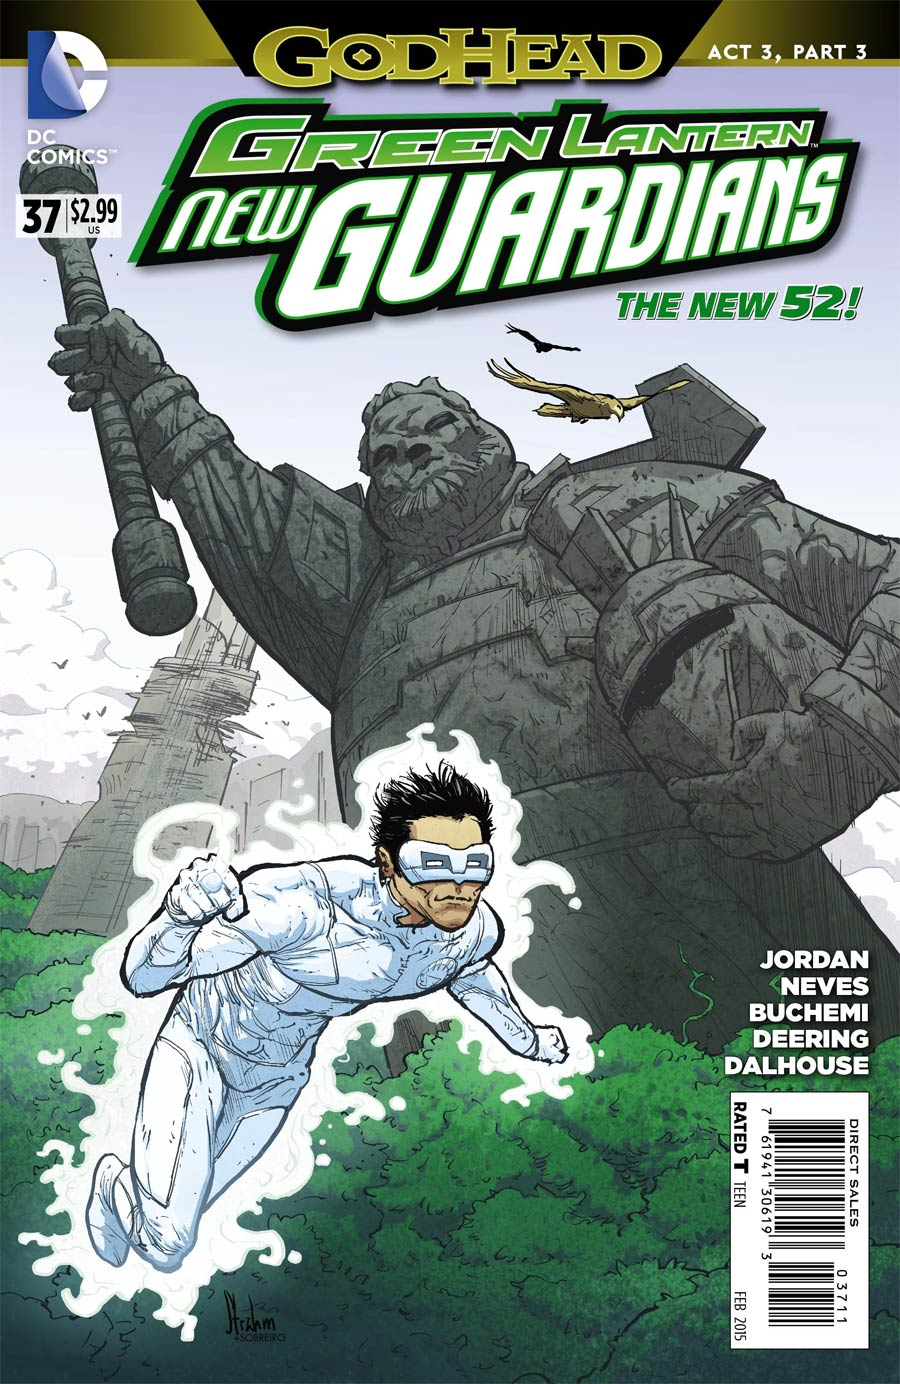 Green Lantern New Guardians #37 (Godhead Act 3 Part 3)